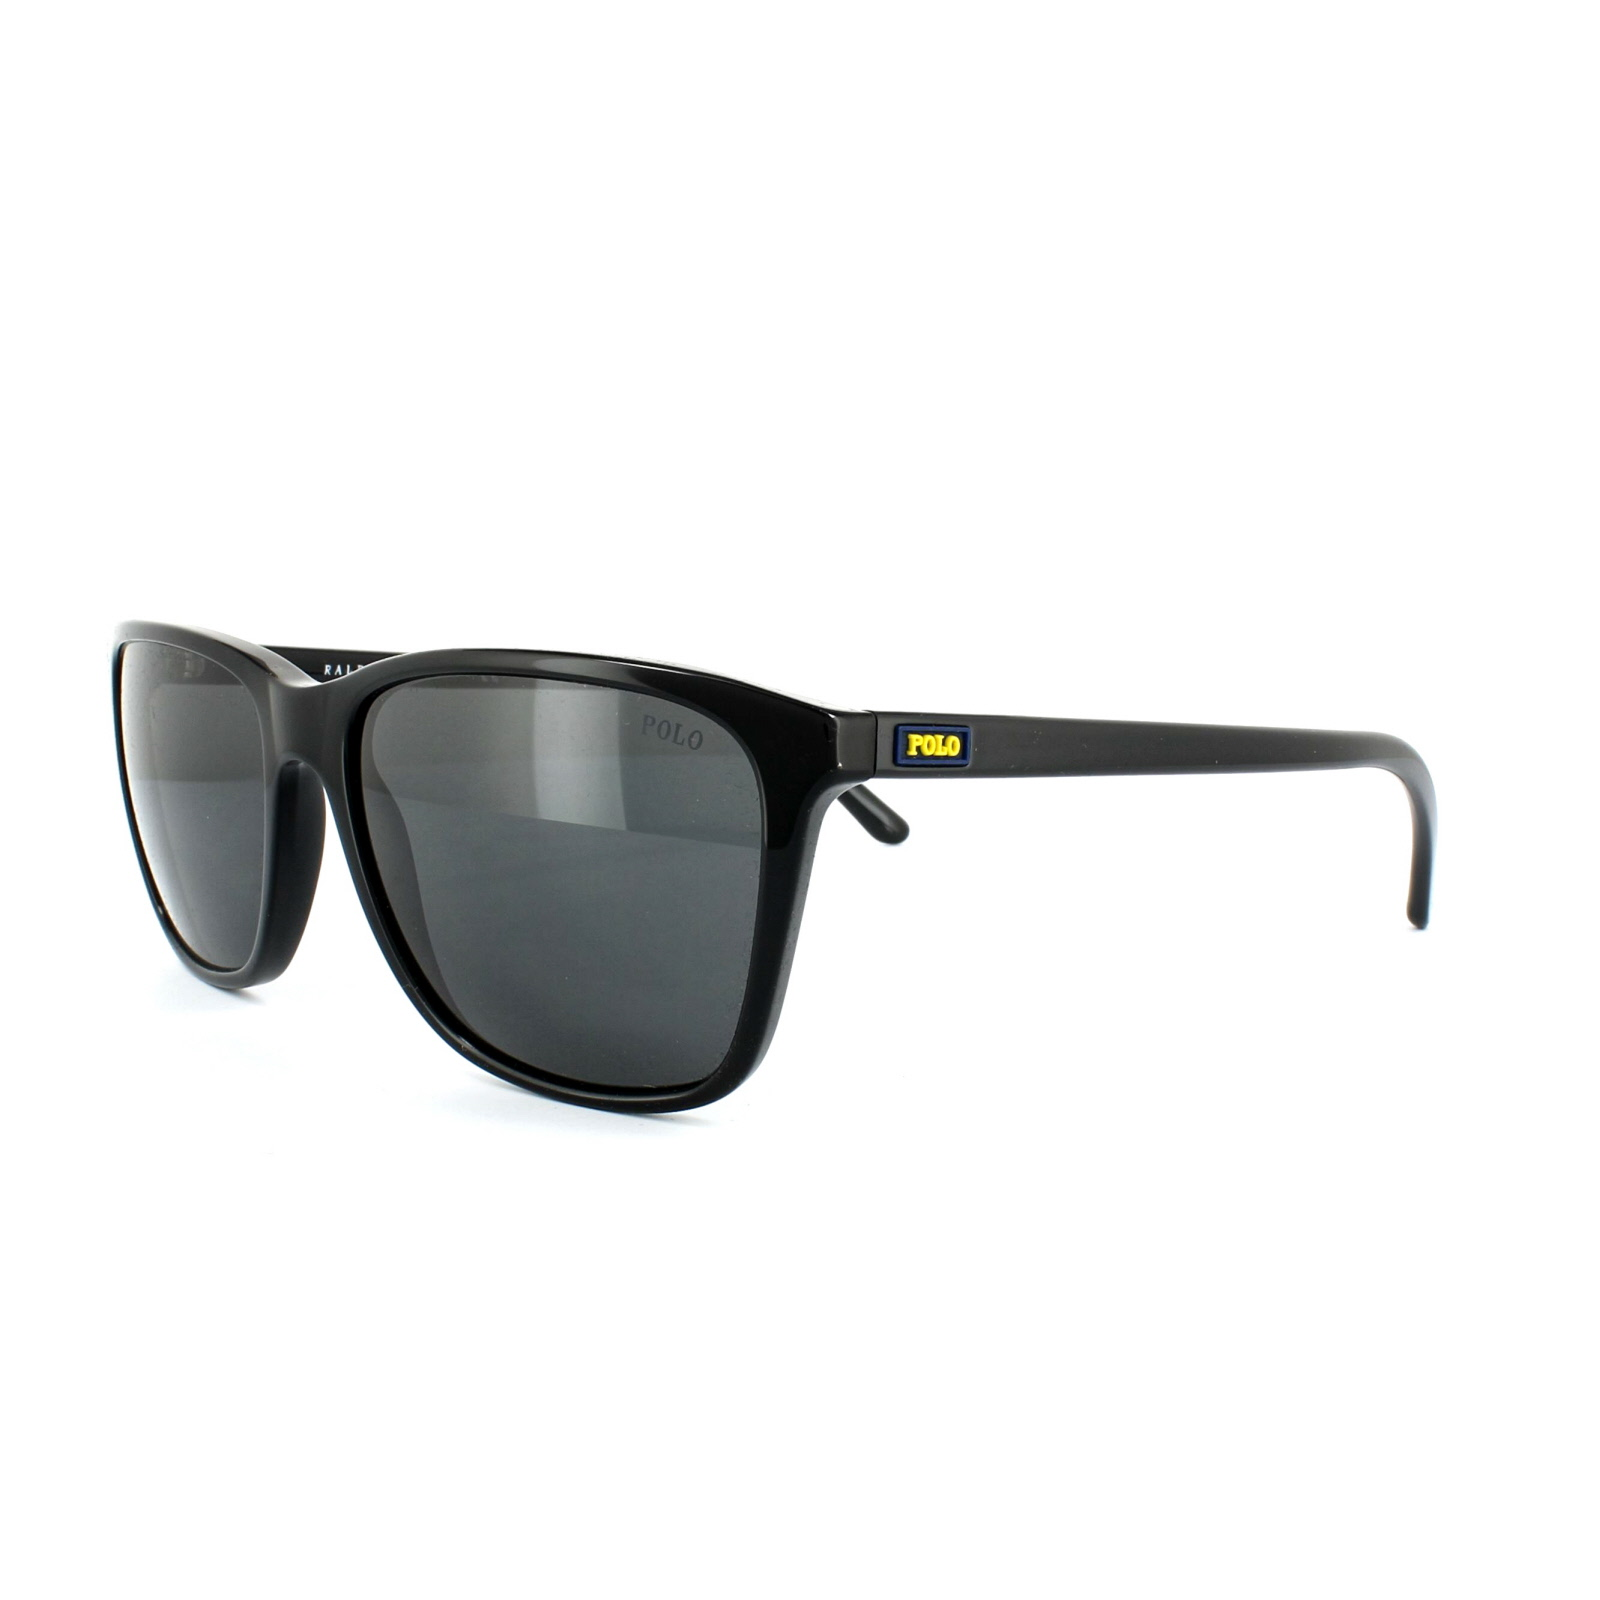 1e090953a Cheap Polo Ralph Lauren 4108 Sunglasses - Discounted Sunglasses